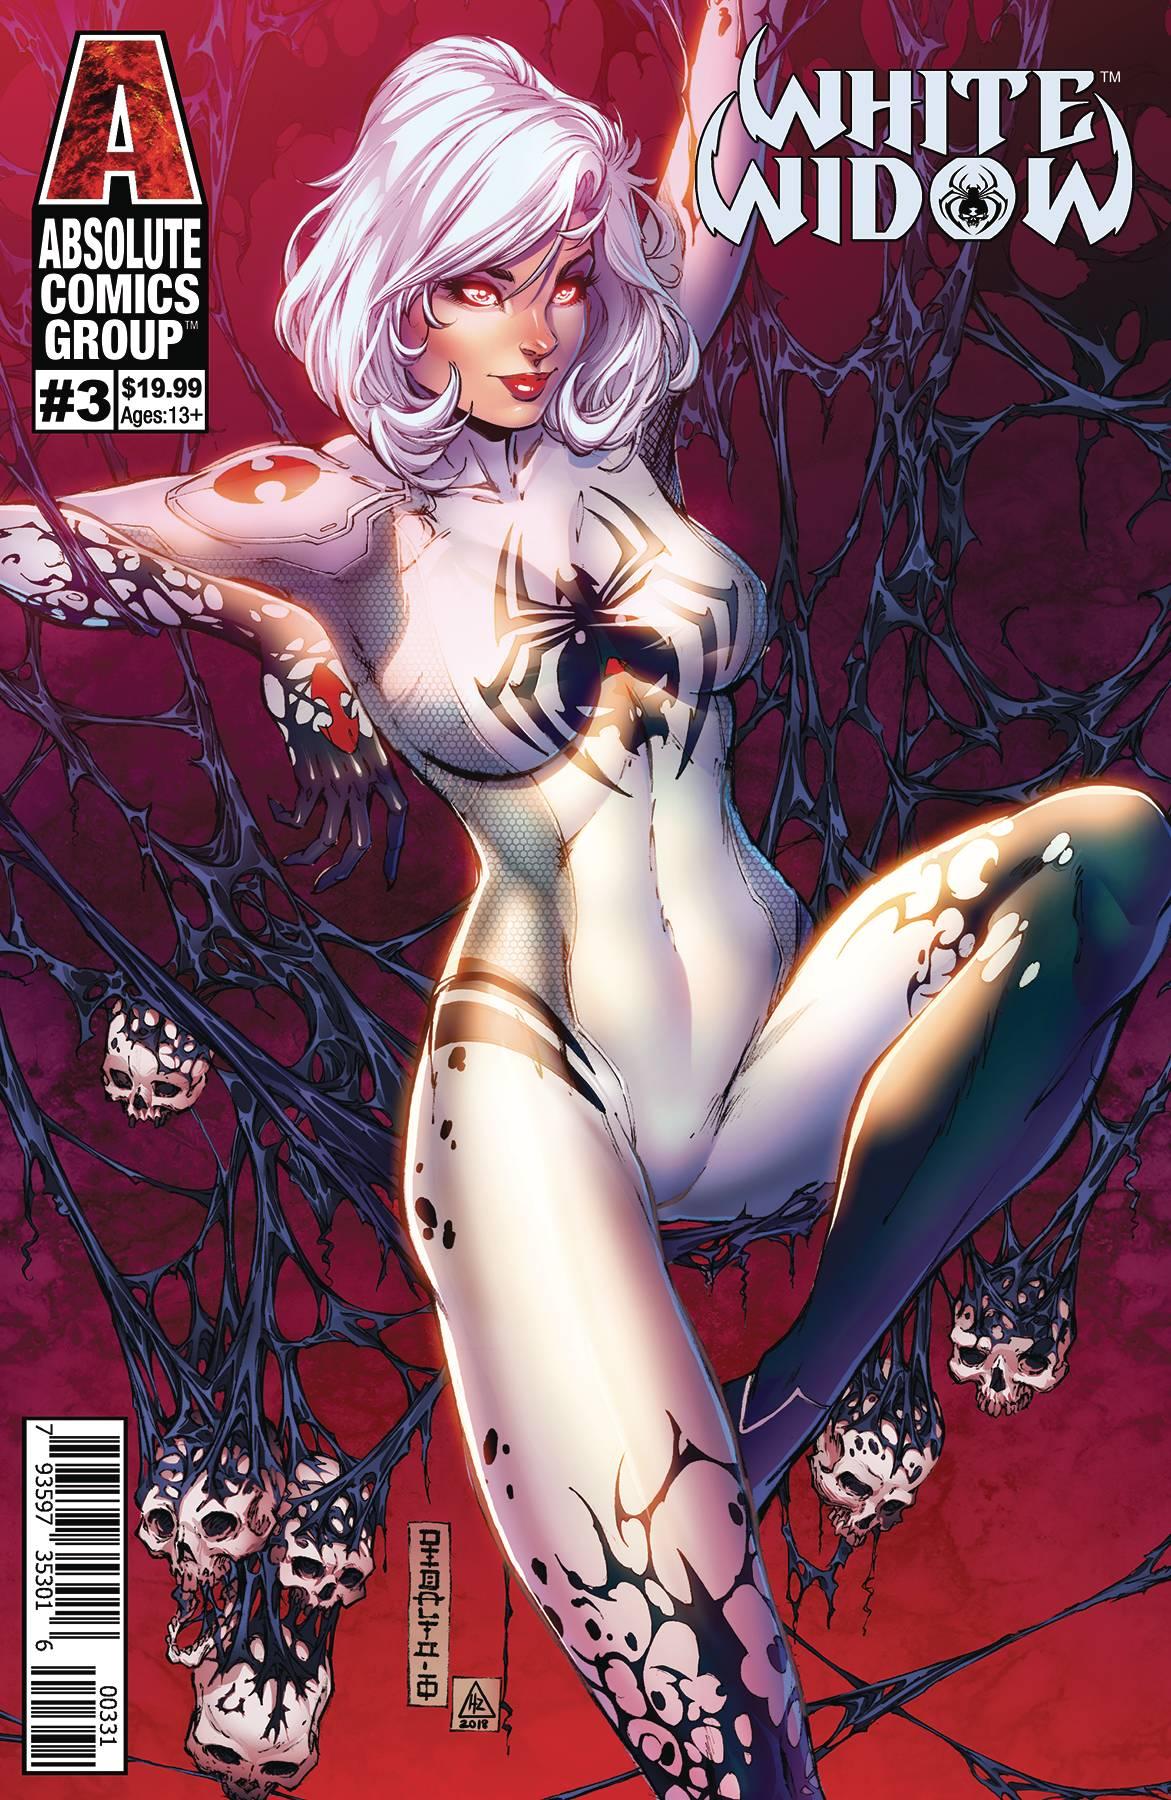 White Widow #3 (2019)